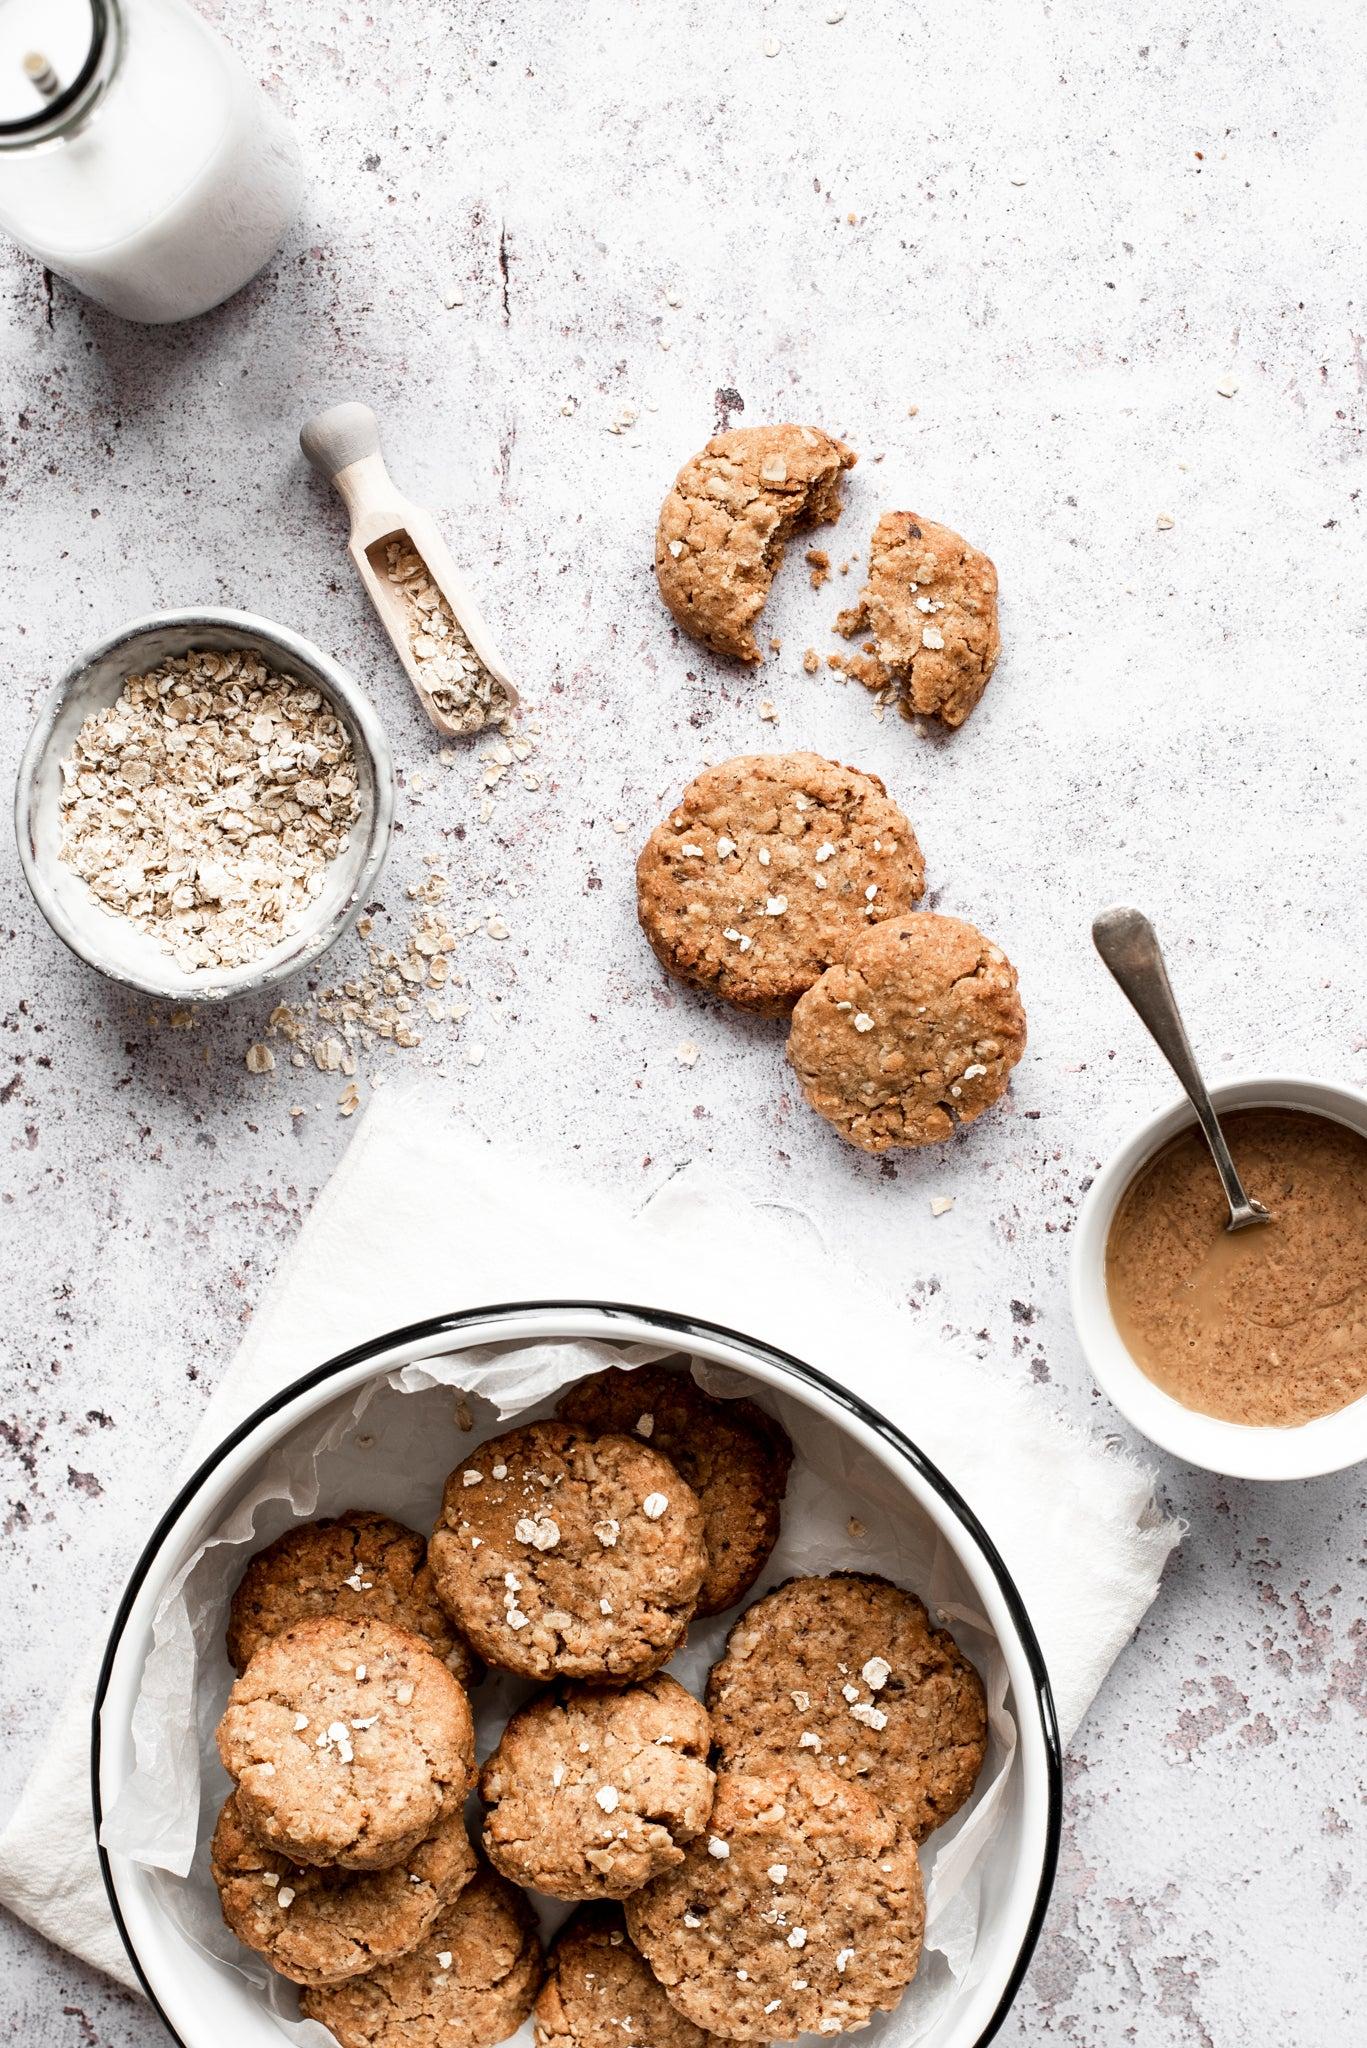 Gluten-Free-And-Vegan-Almond-Butter-Cookies-WEB-RES-4.jpg